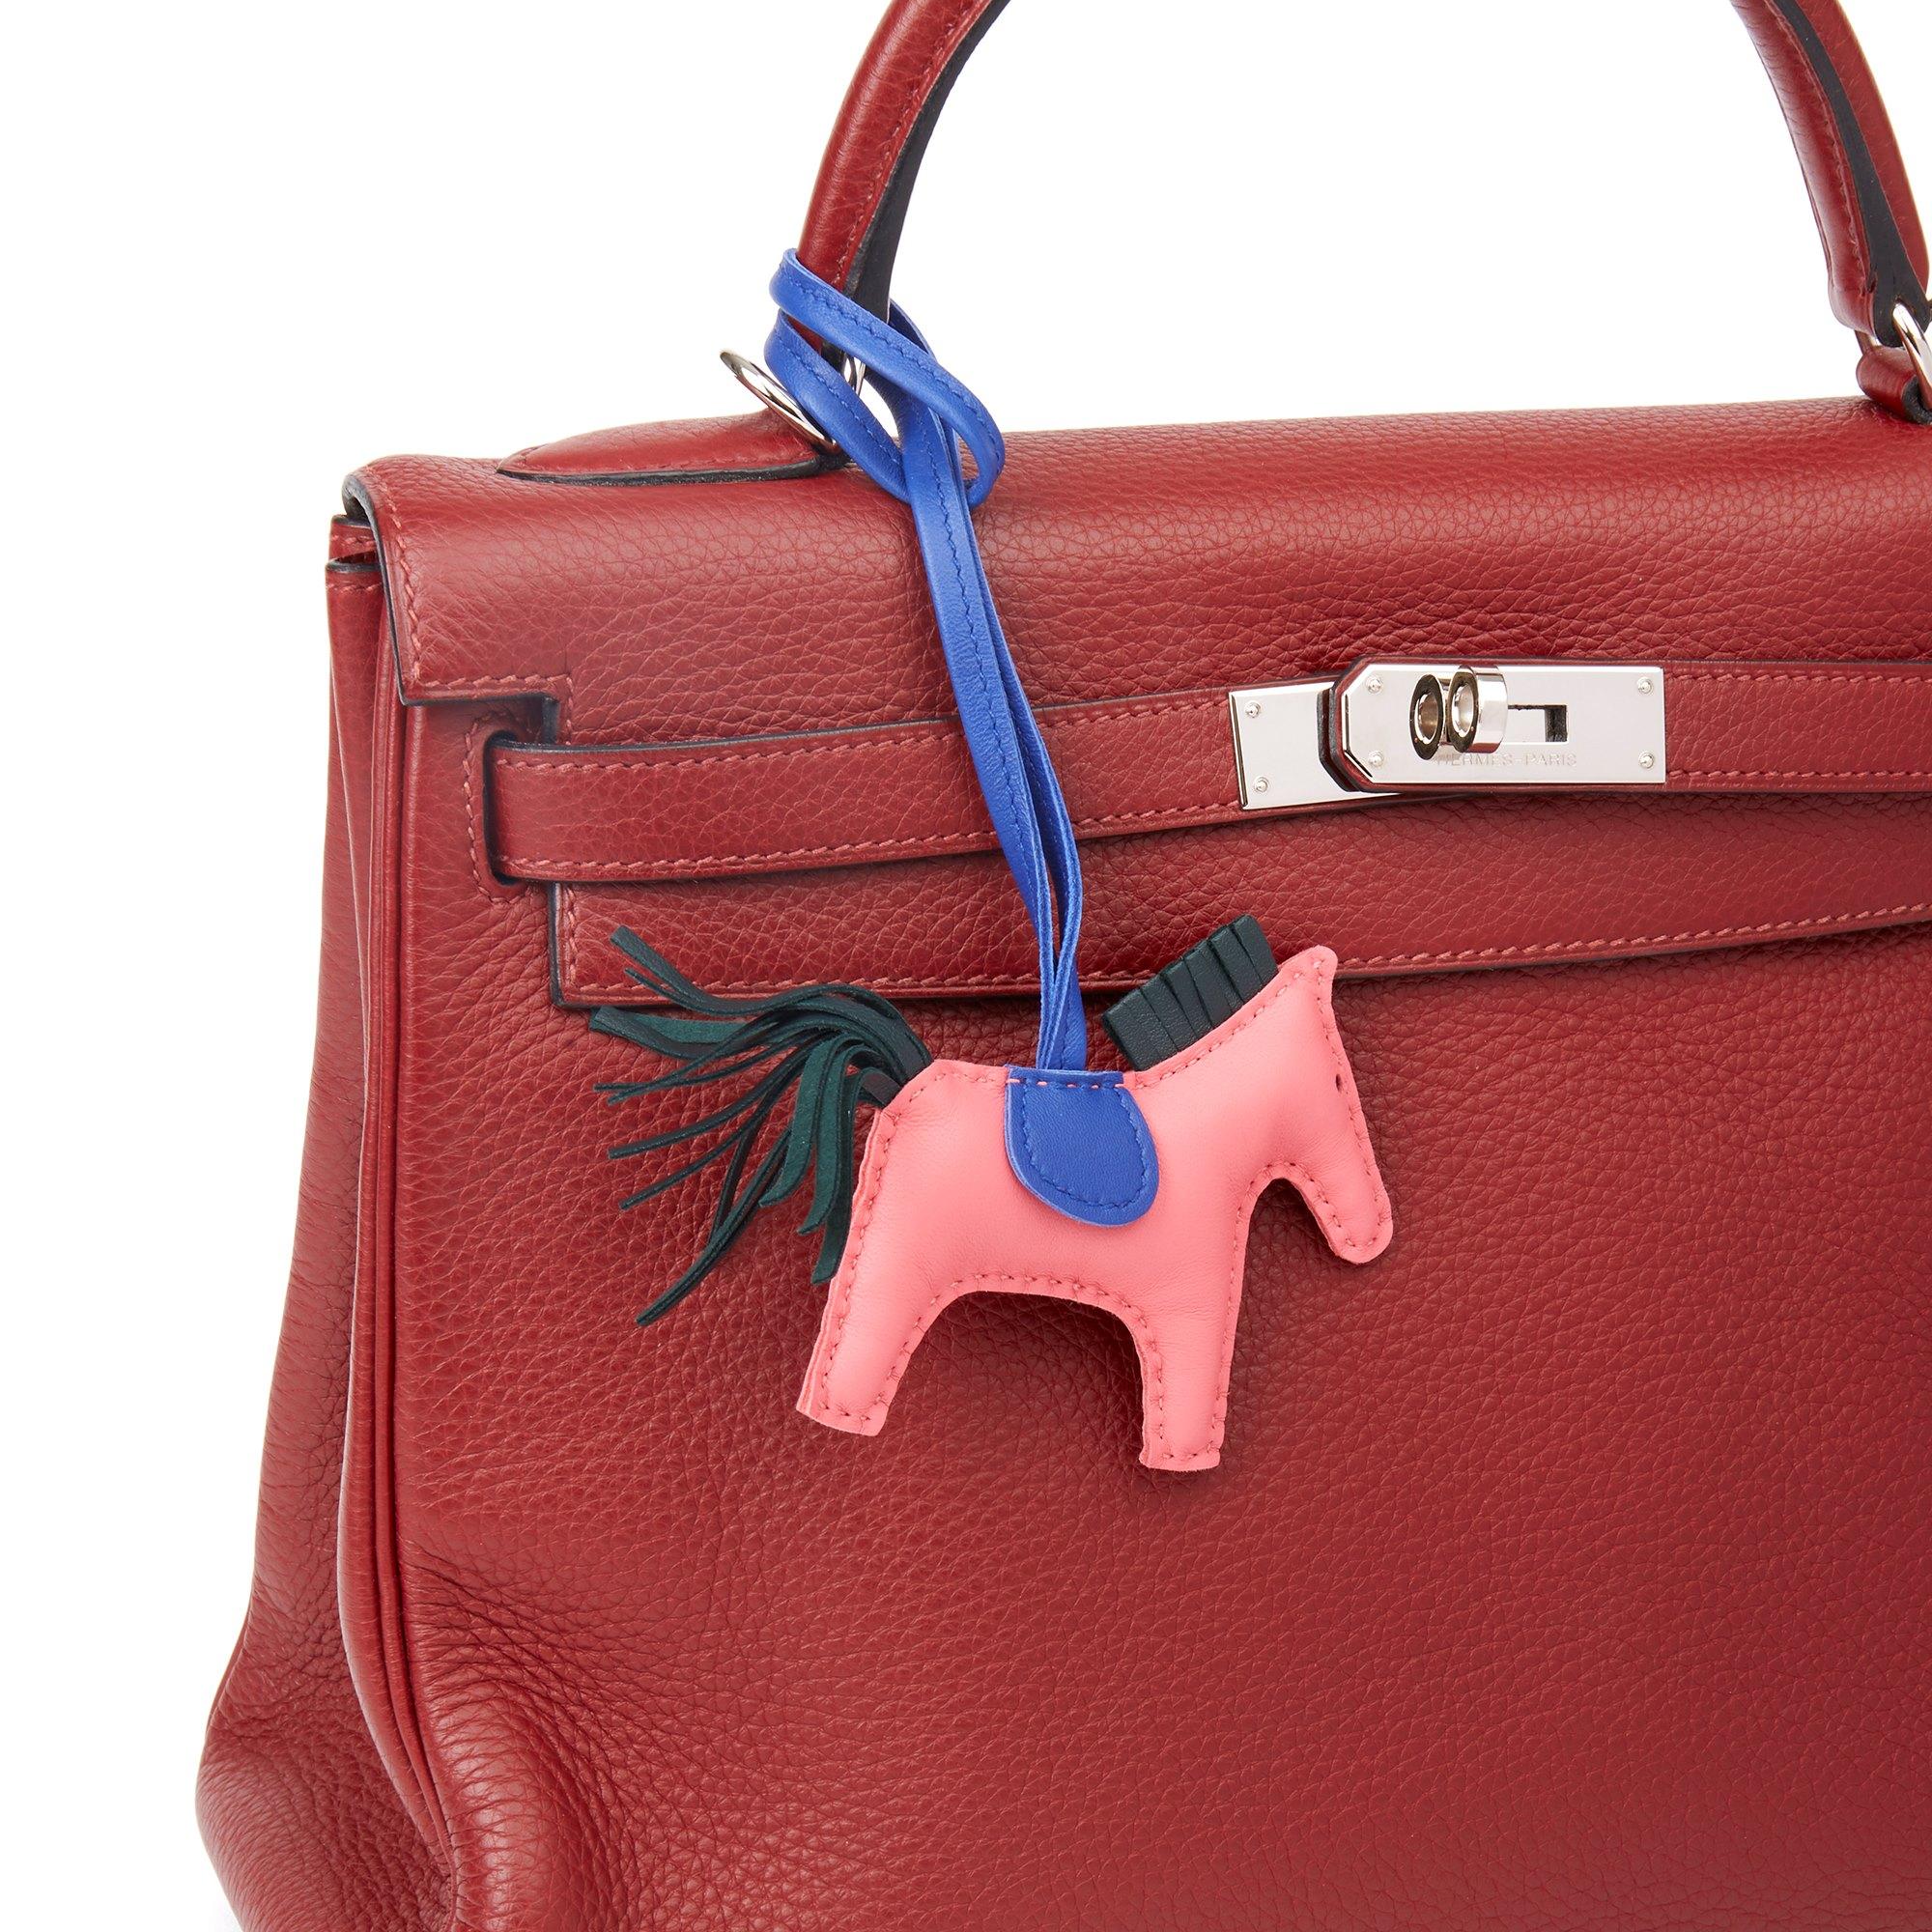 Hermès Bleu Electric, Vert Fonce & Rose Azalee Swift Leather Rodeo PM